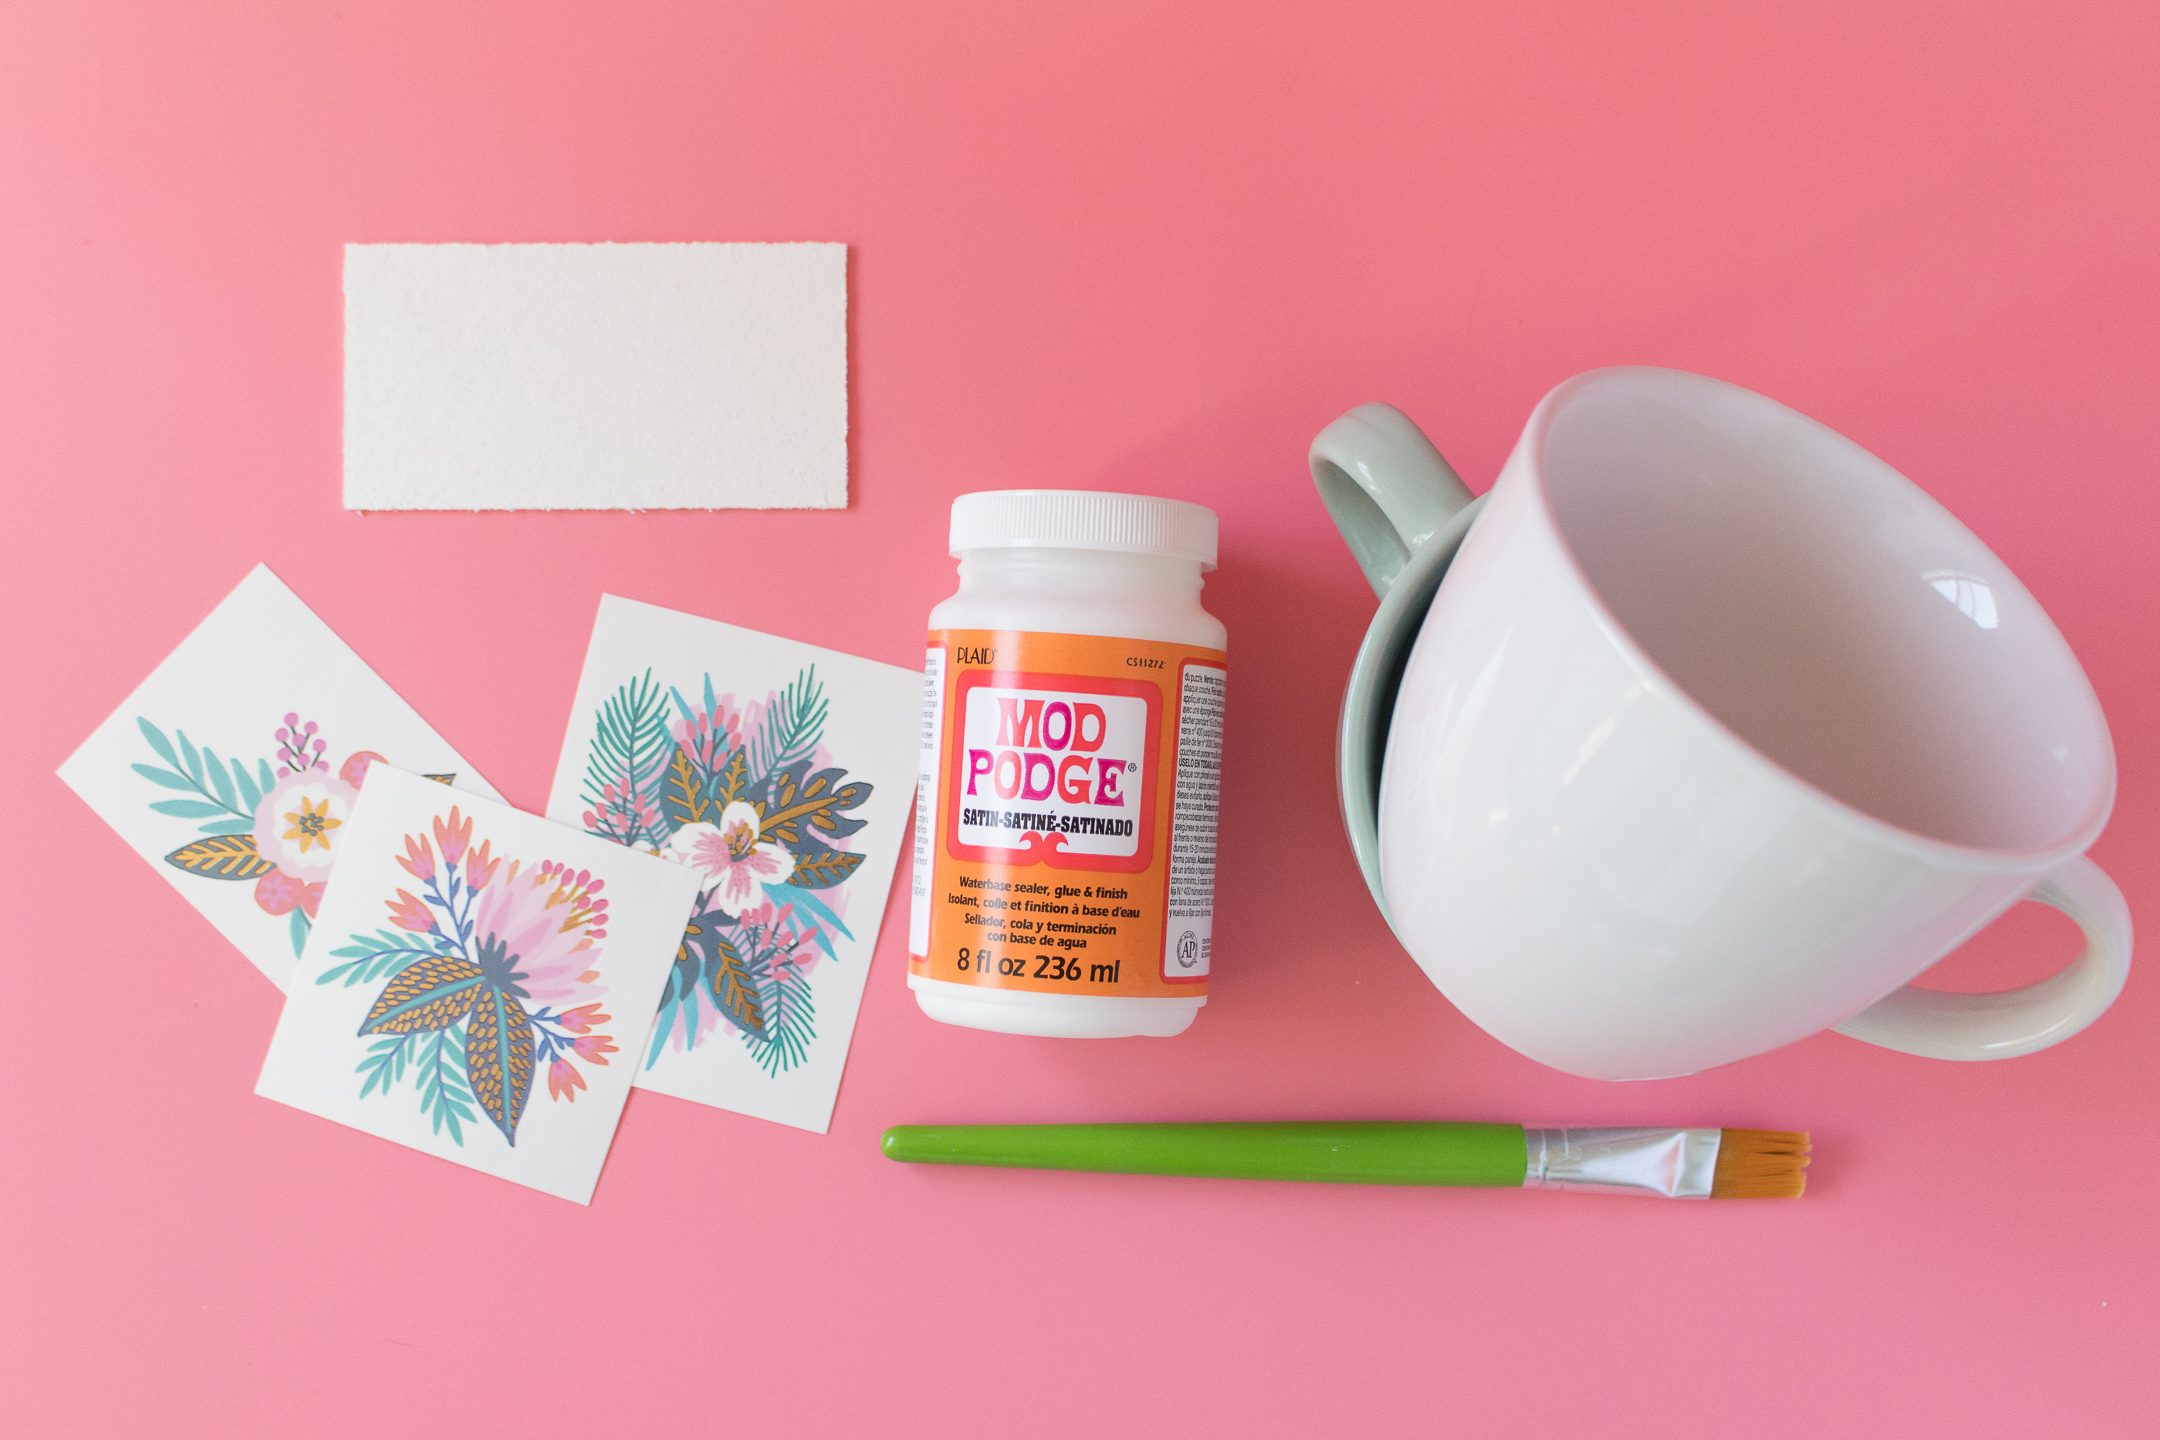 Photo of supplies needed to make custom mugs with temporary tattoos.